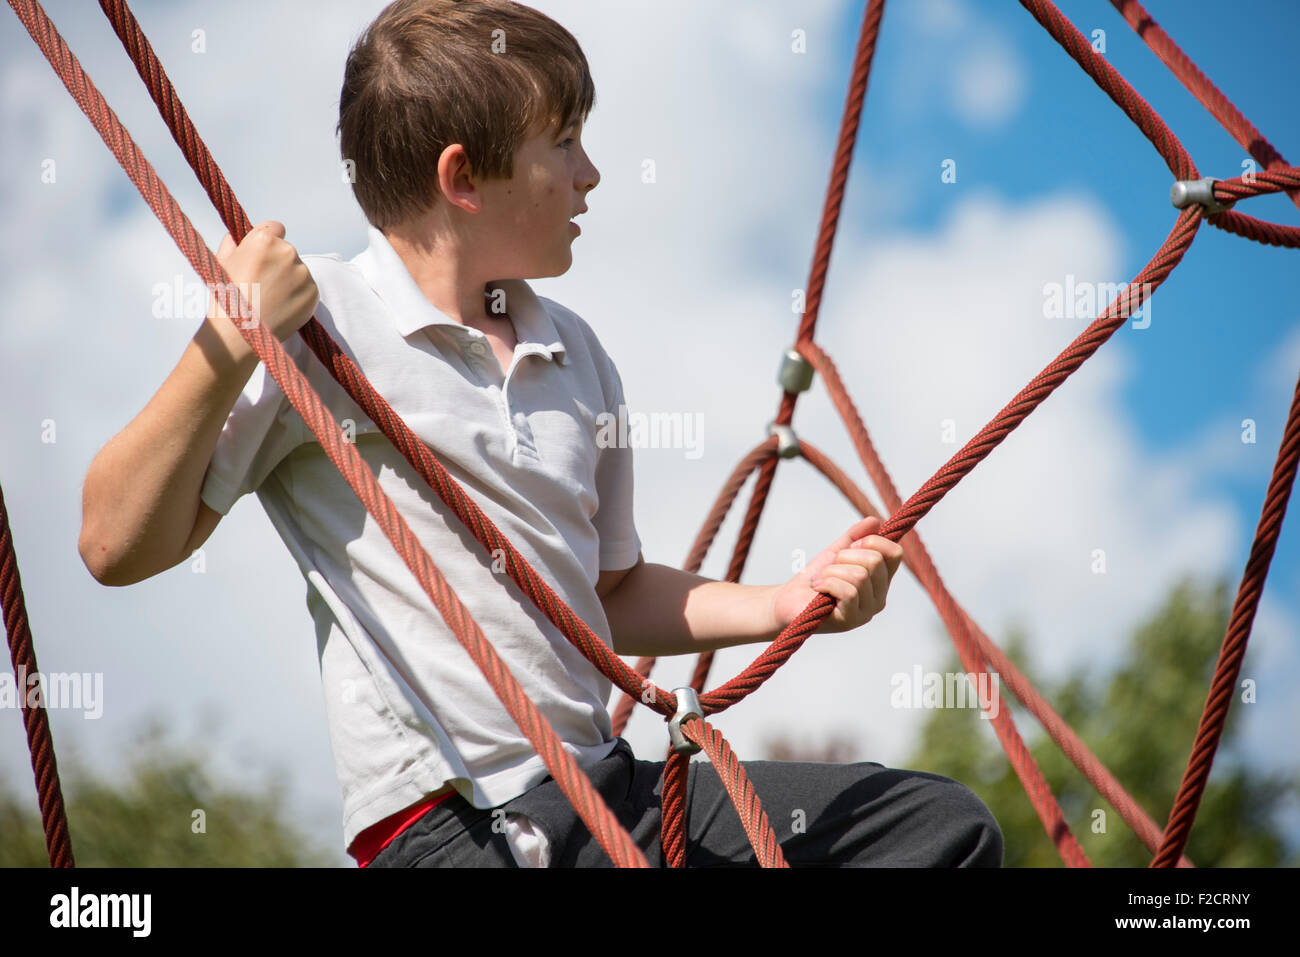 Klettergerüst Pyramide : Junge klettern seil frame pyramide stockfoto bild: 87563223 alamy